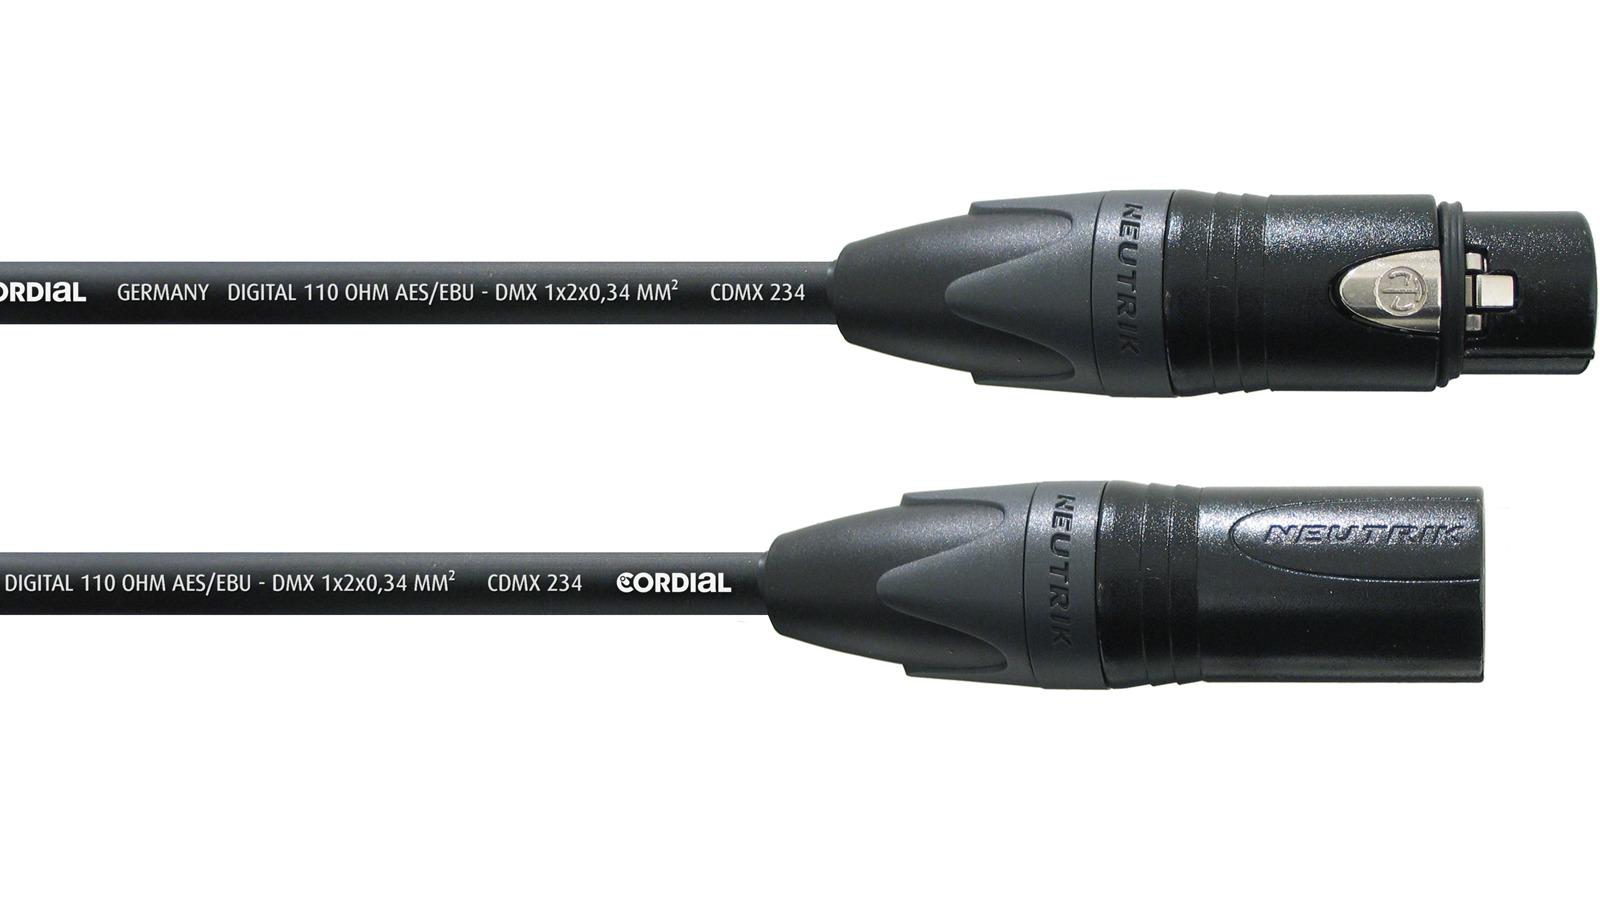 Cordial AES/EBU DMX Kabel 1 m CPD 1 FM